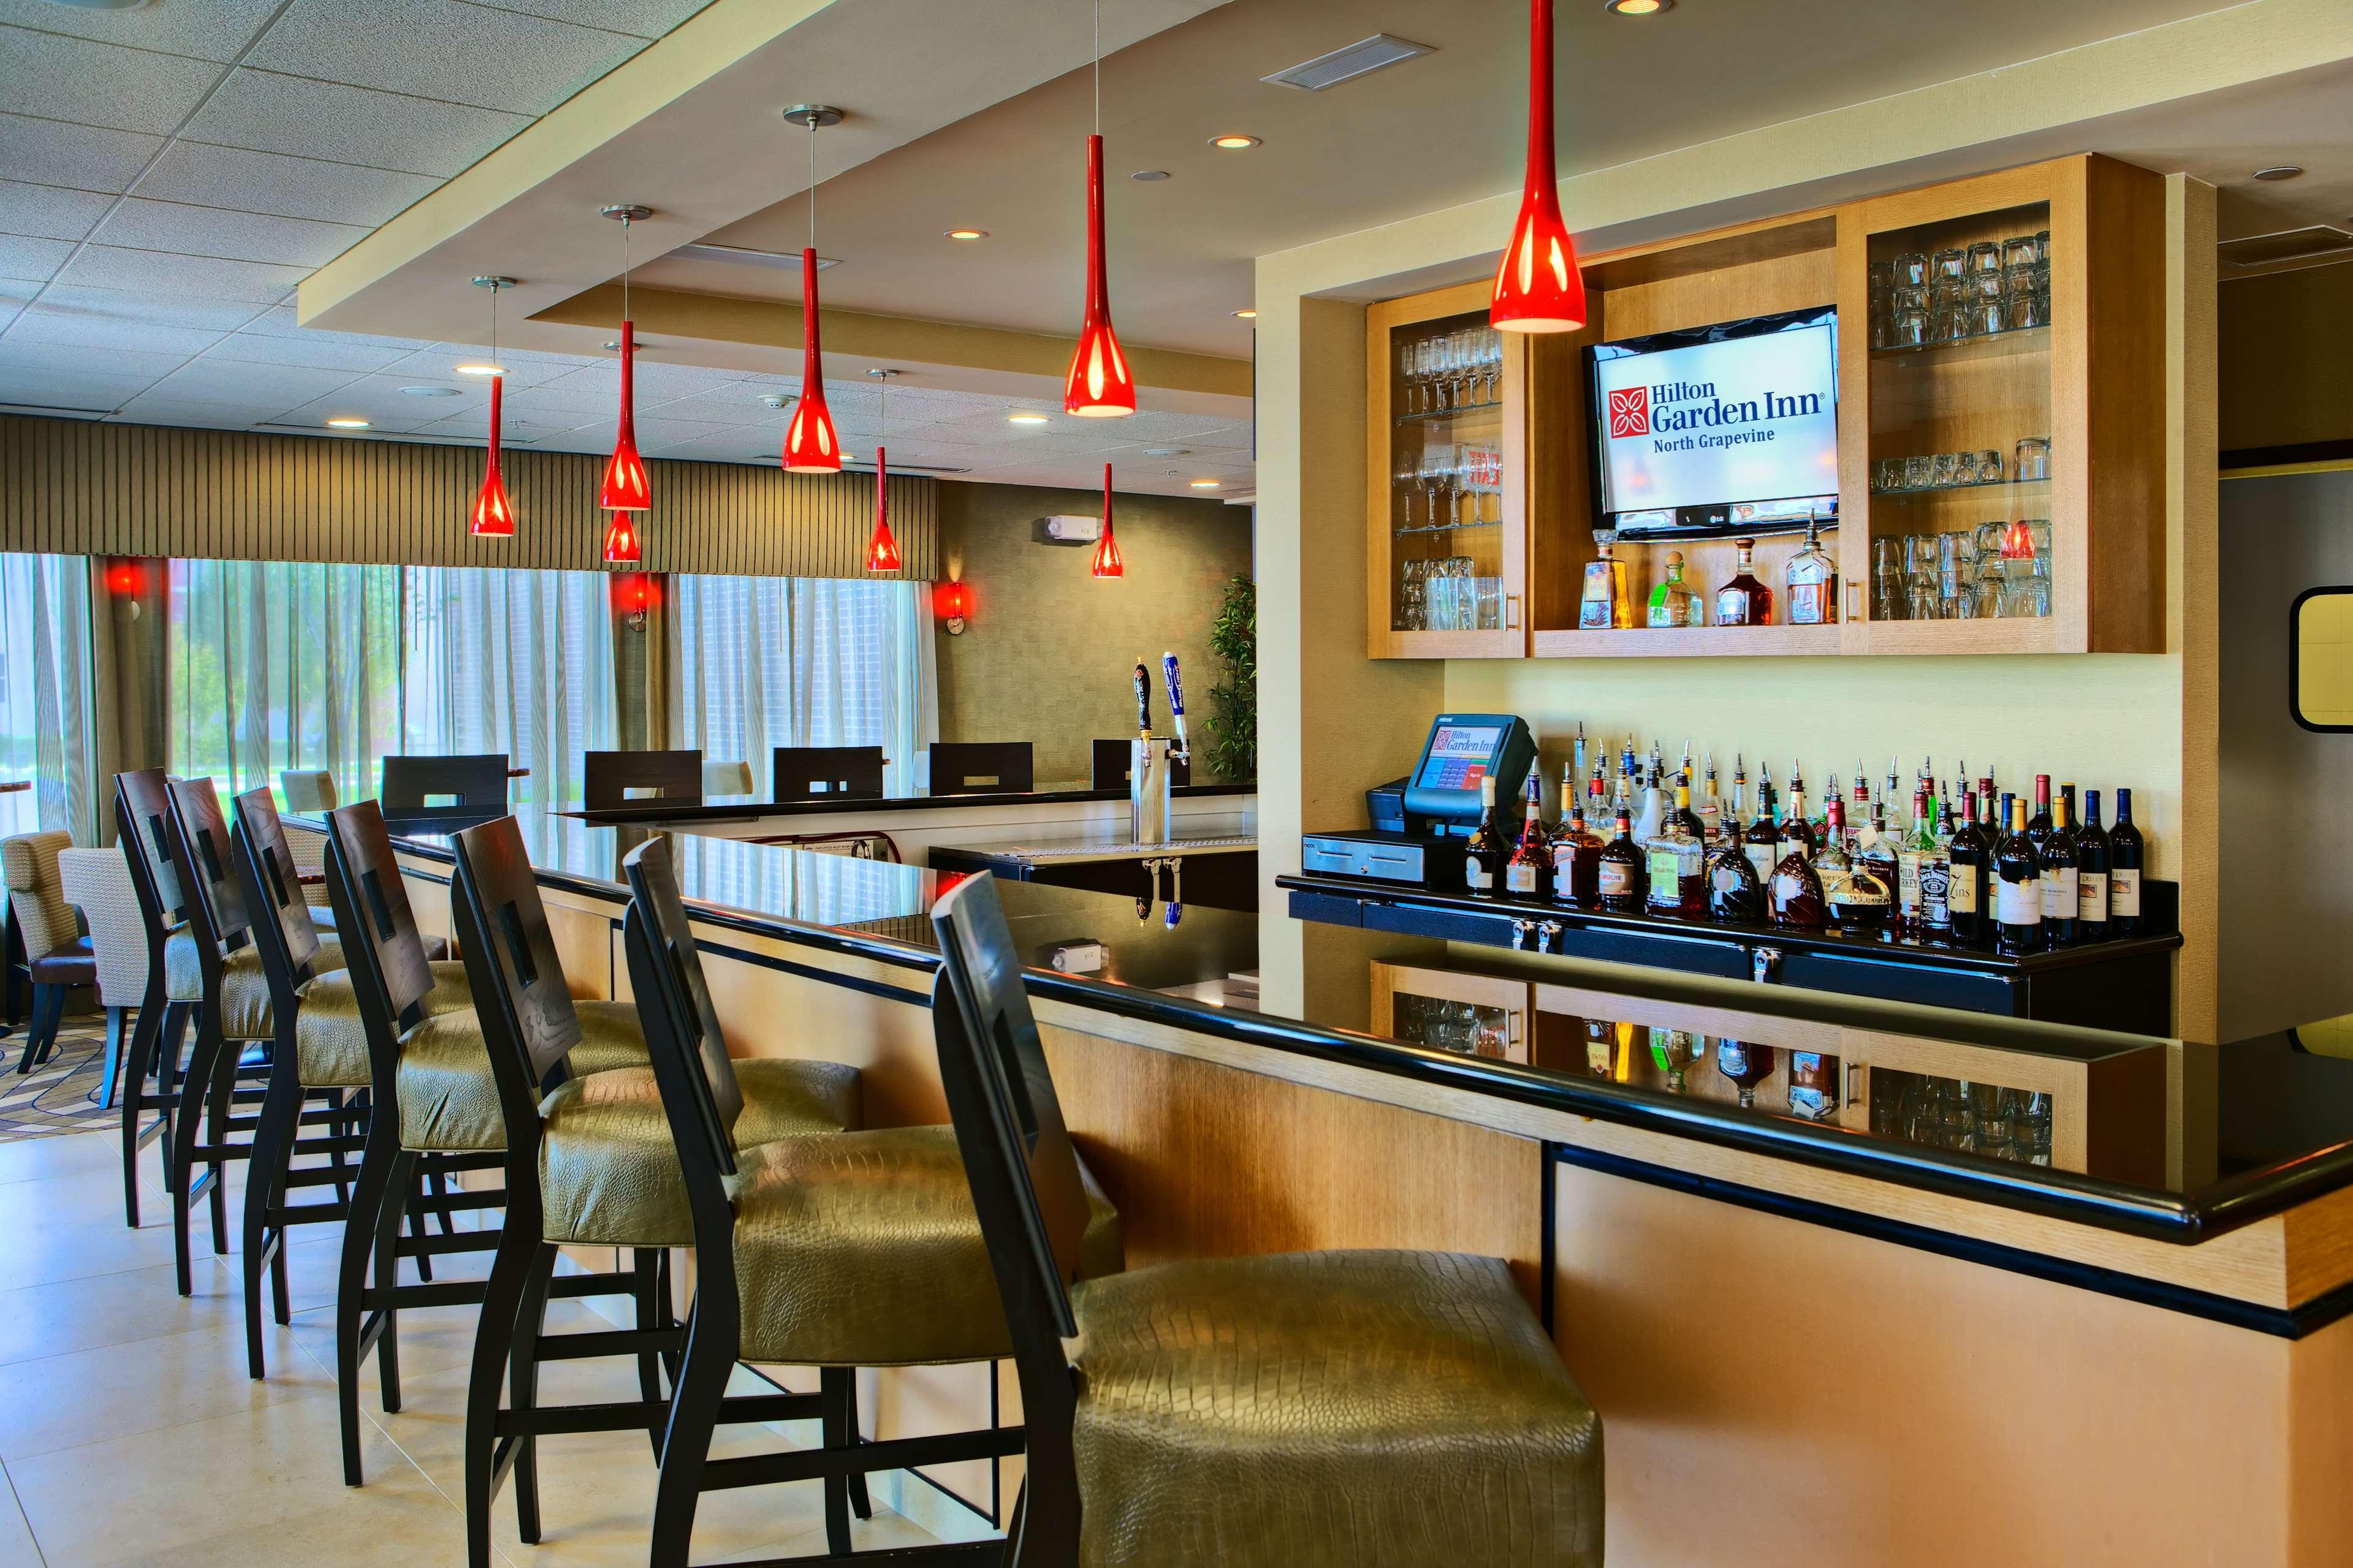 Hilton Garden Inn DFW North Grapevine image 45